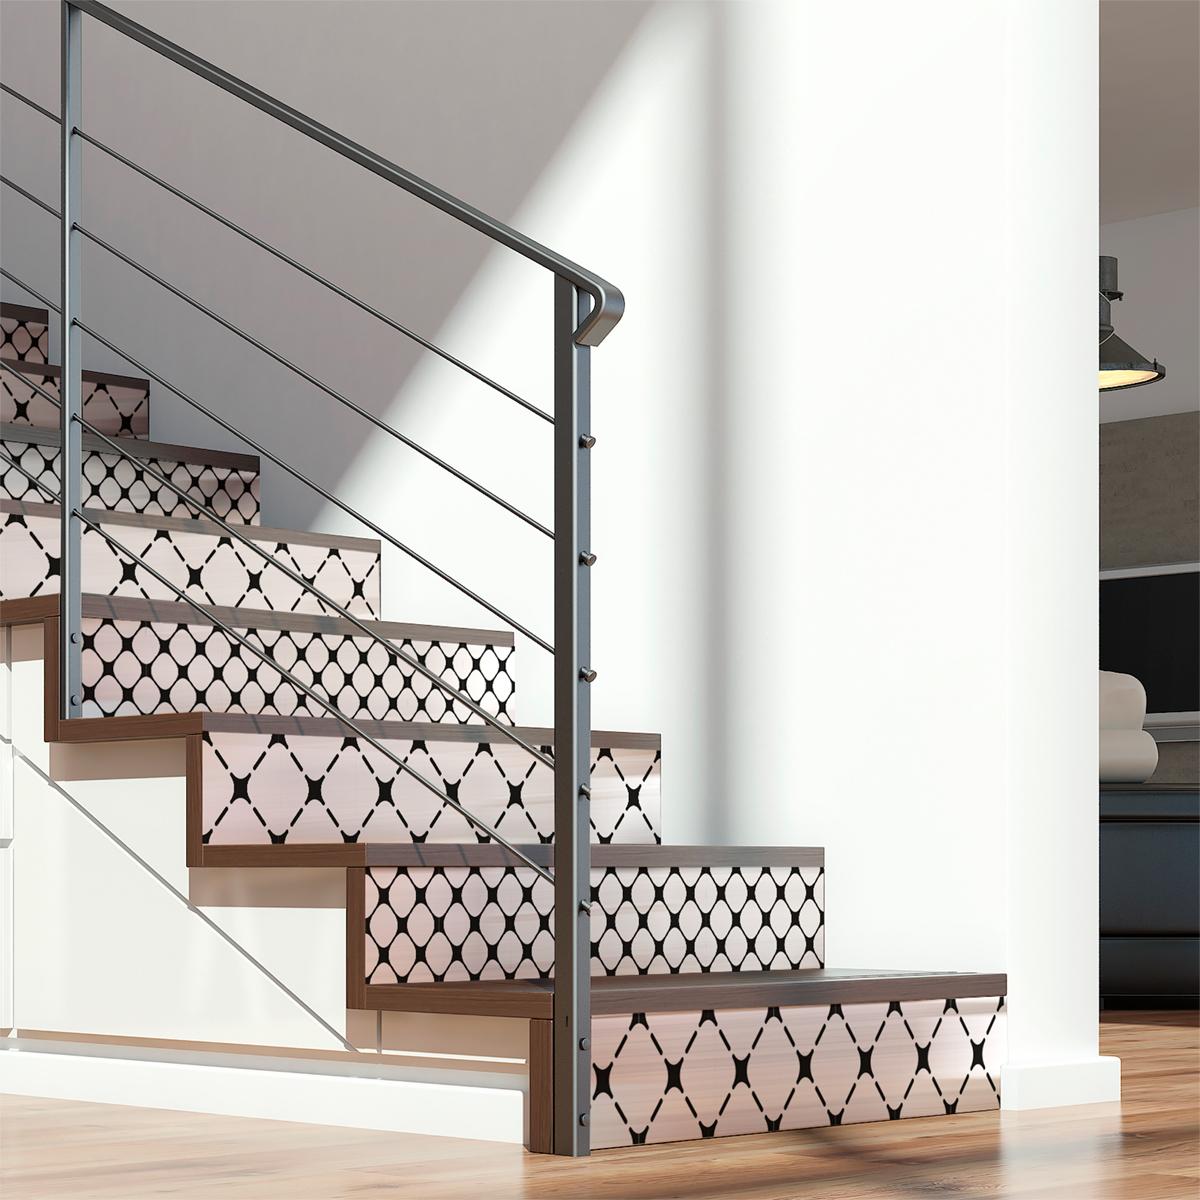 stickers contremarche sanela x 2 stickers carrelage stickers carrelage escalier ambiance sticker. Black Bedroom Furniture Sets. Home Design Ideas